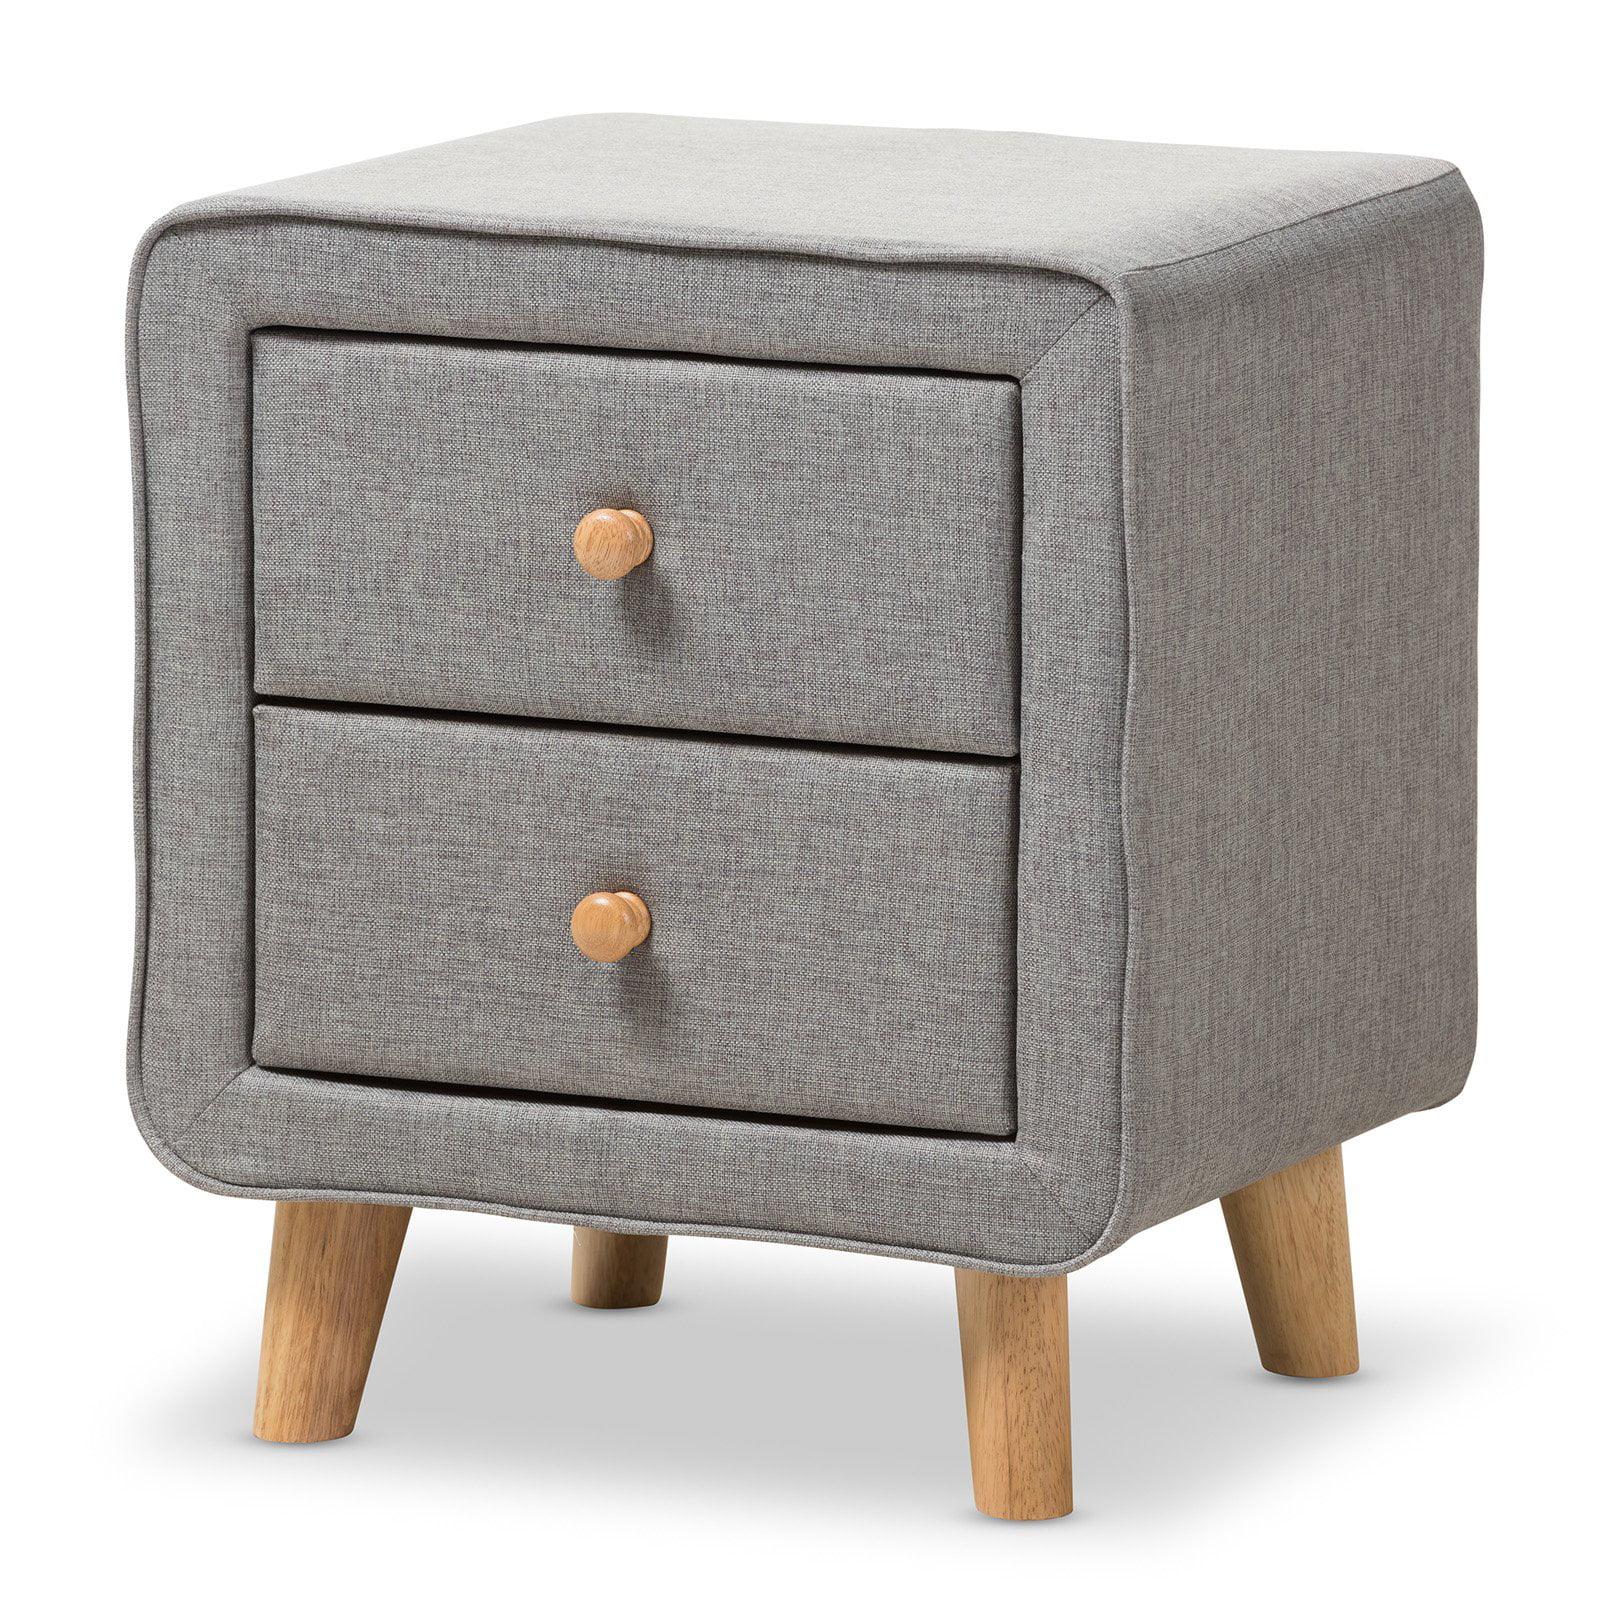 Baxton Studio Jonesy Mid-Century Grey Fabric Upholstered 2-Drawer Nightstand